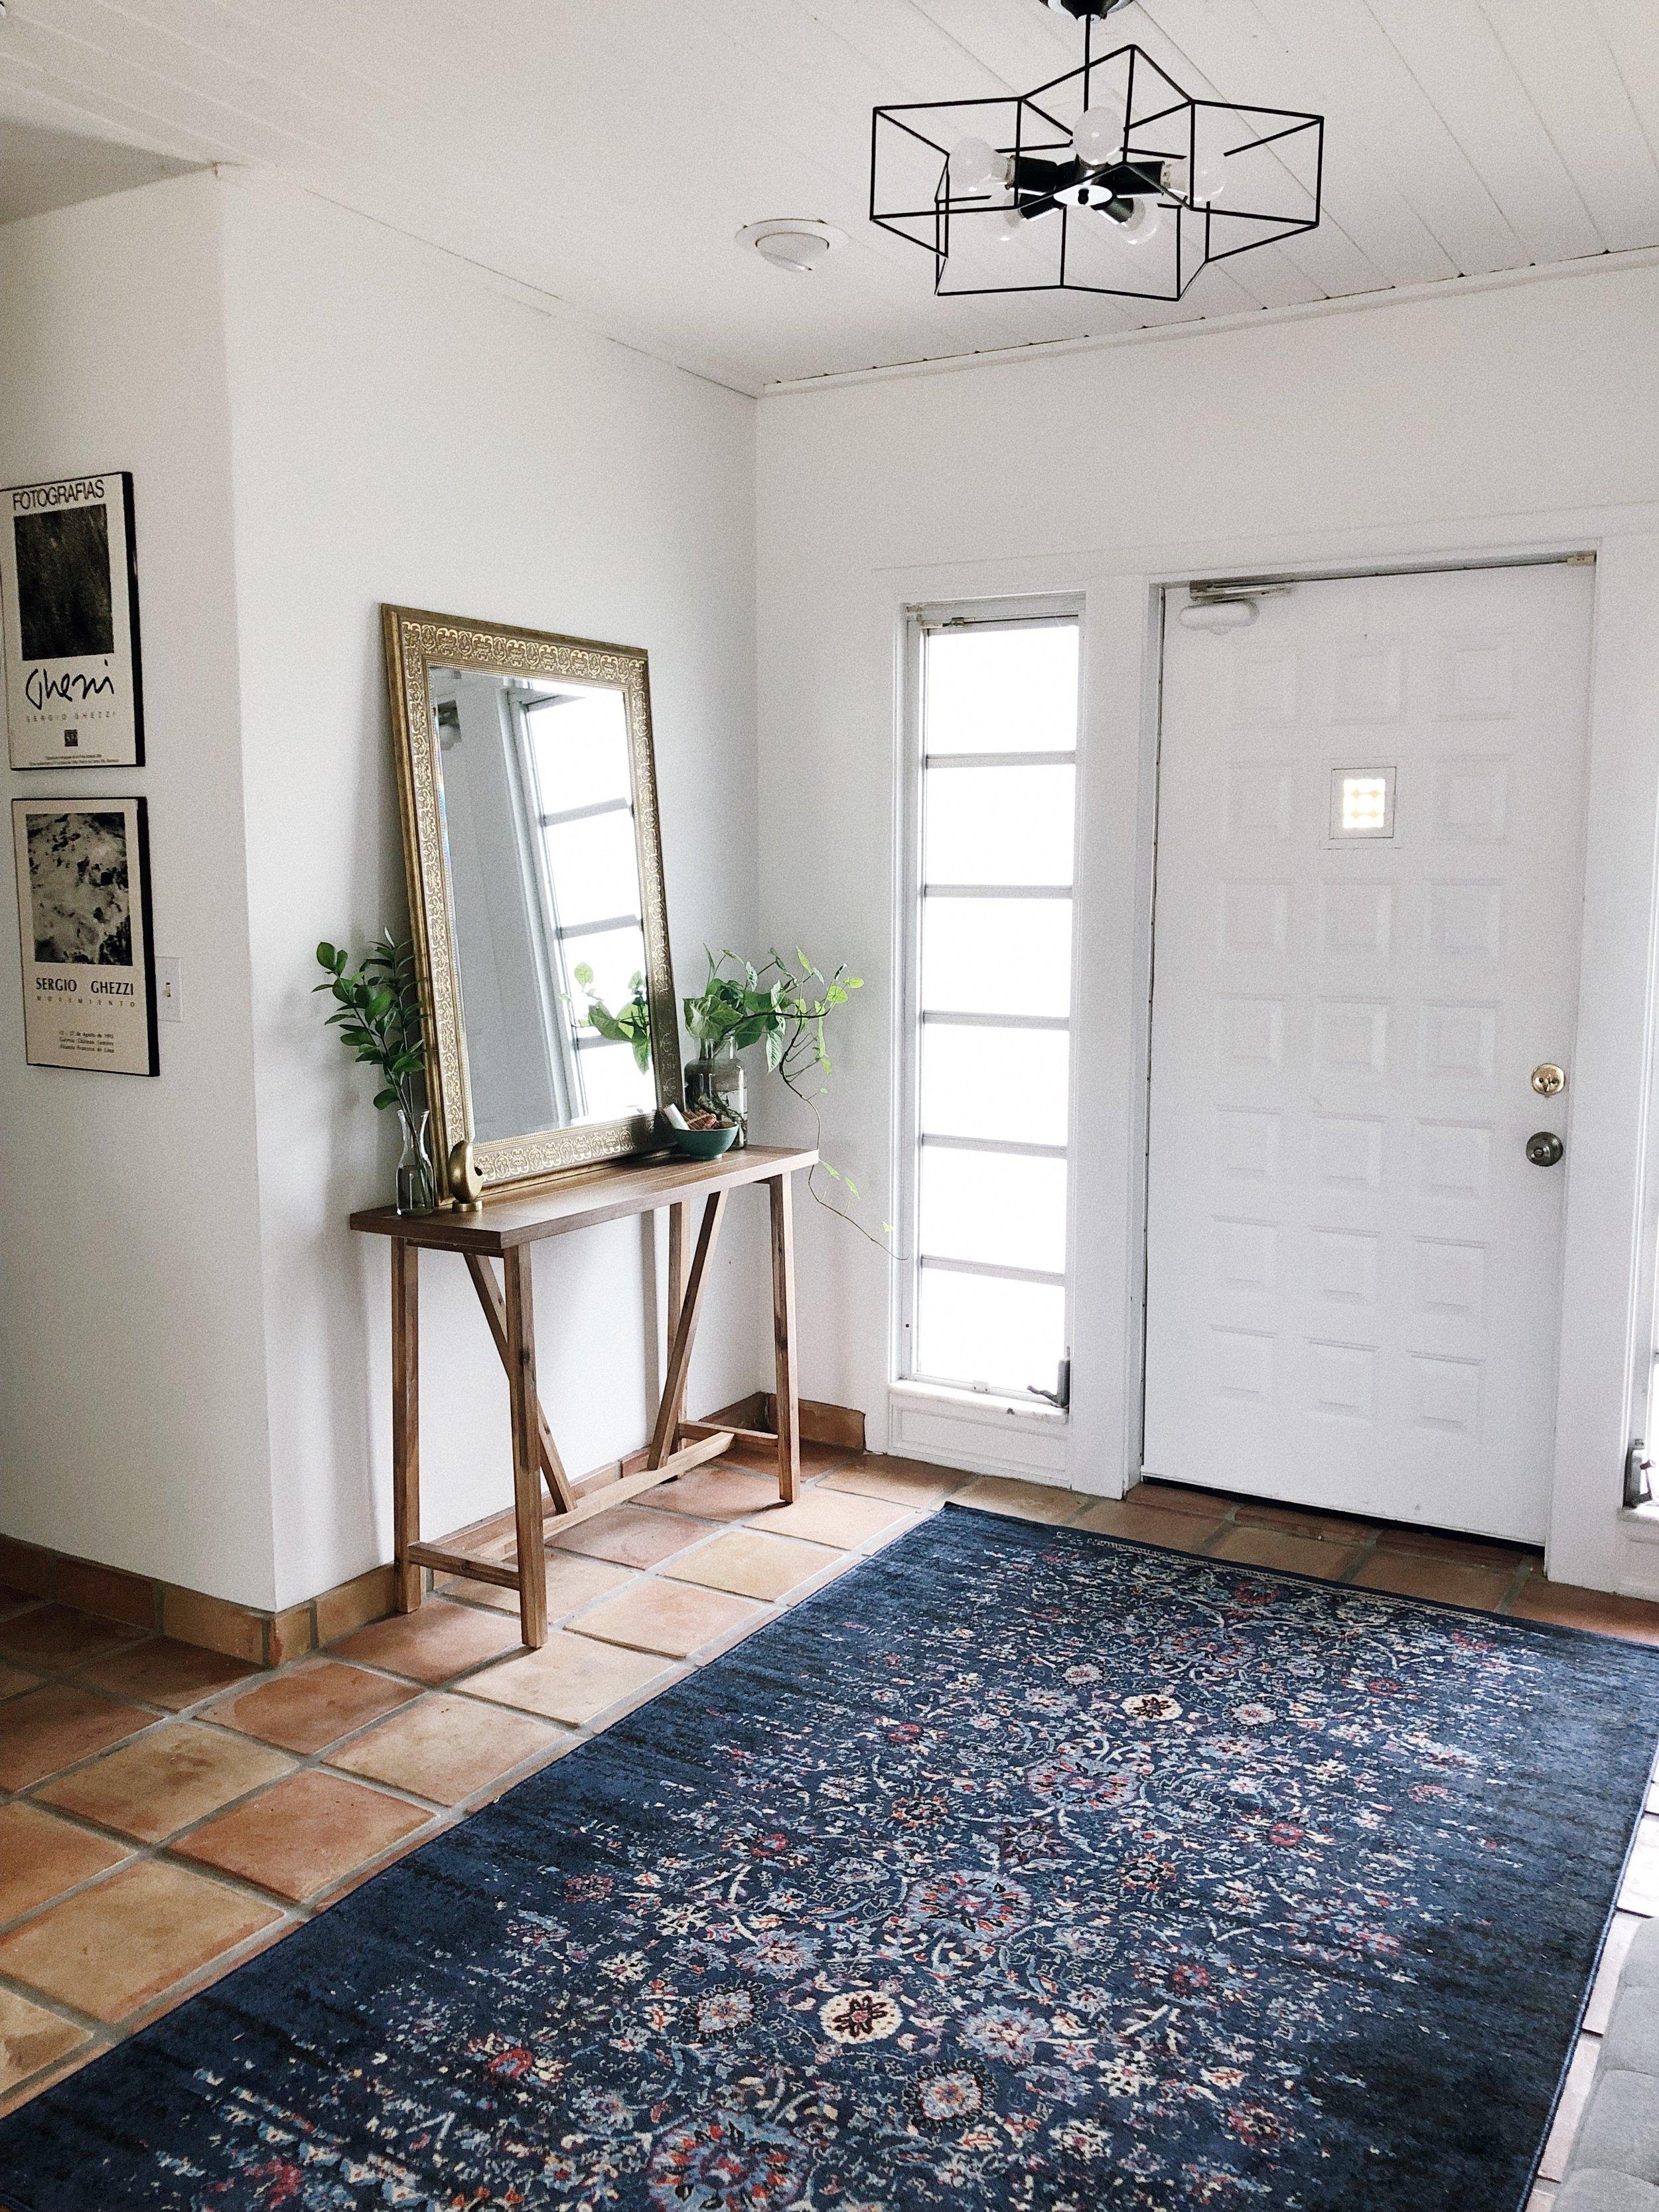 Modern Bohemian Home Decor Living Room Interior Design 3.jpg